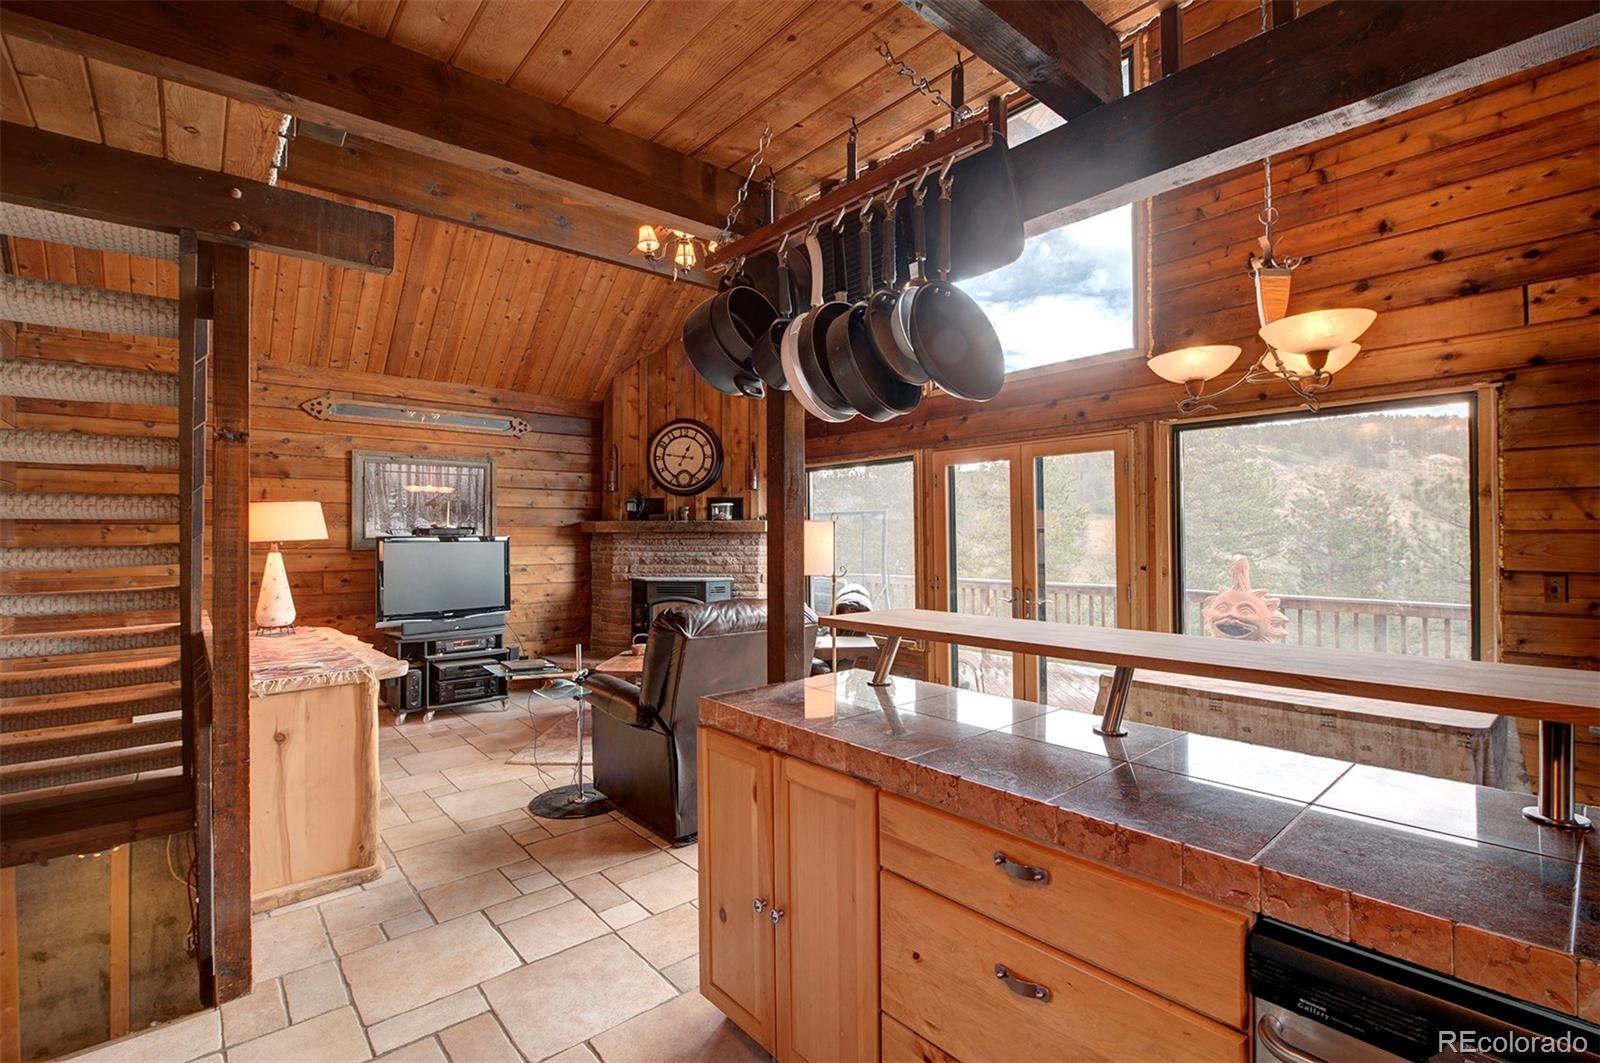 MLS# 6922377 - 3 - 12123 Geronimo Trail, Conifer, CO 80433